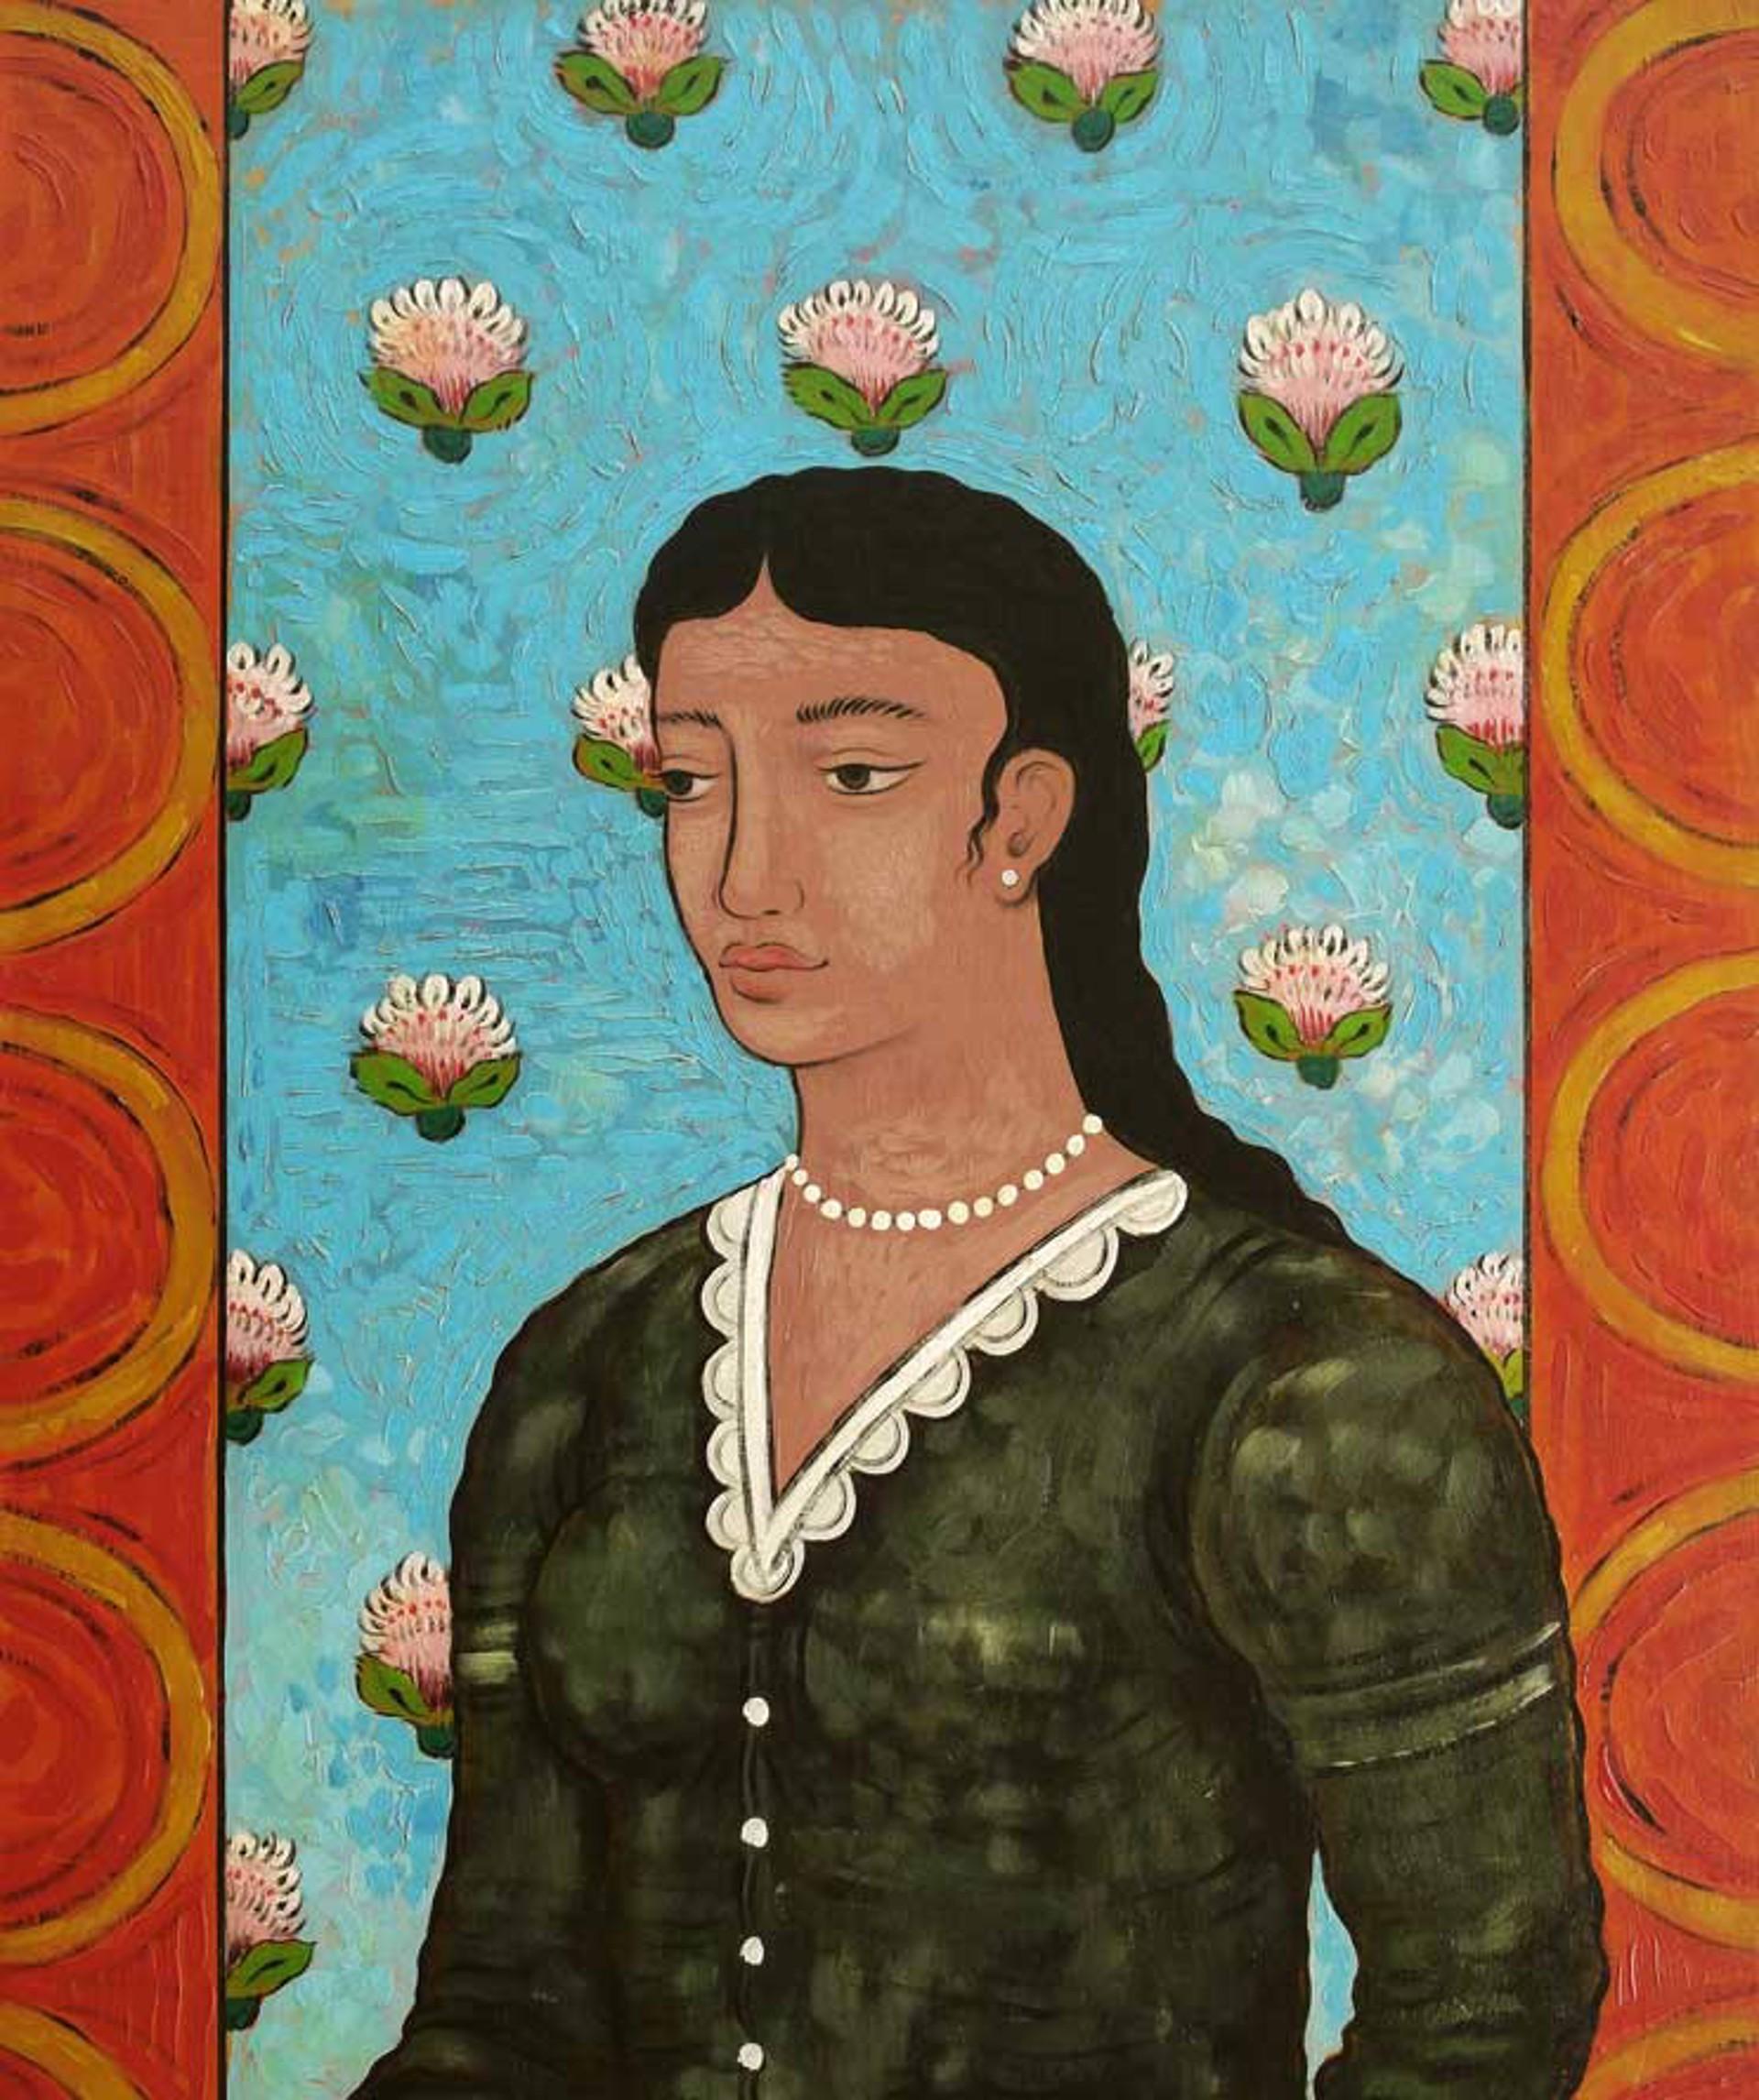 Woman in Black Dress by Mark Briscoe